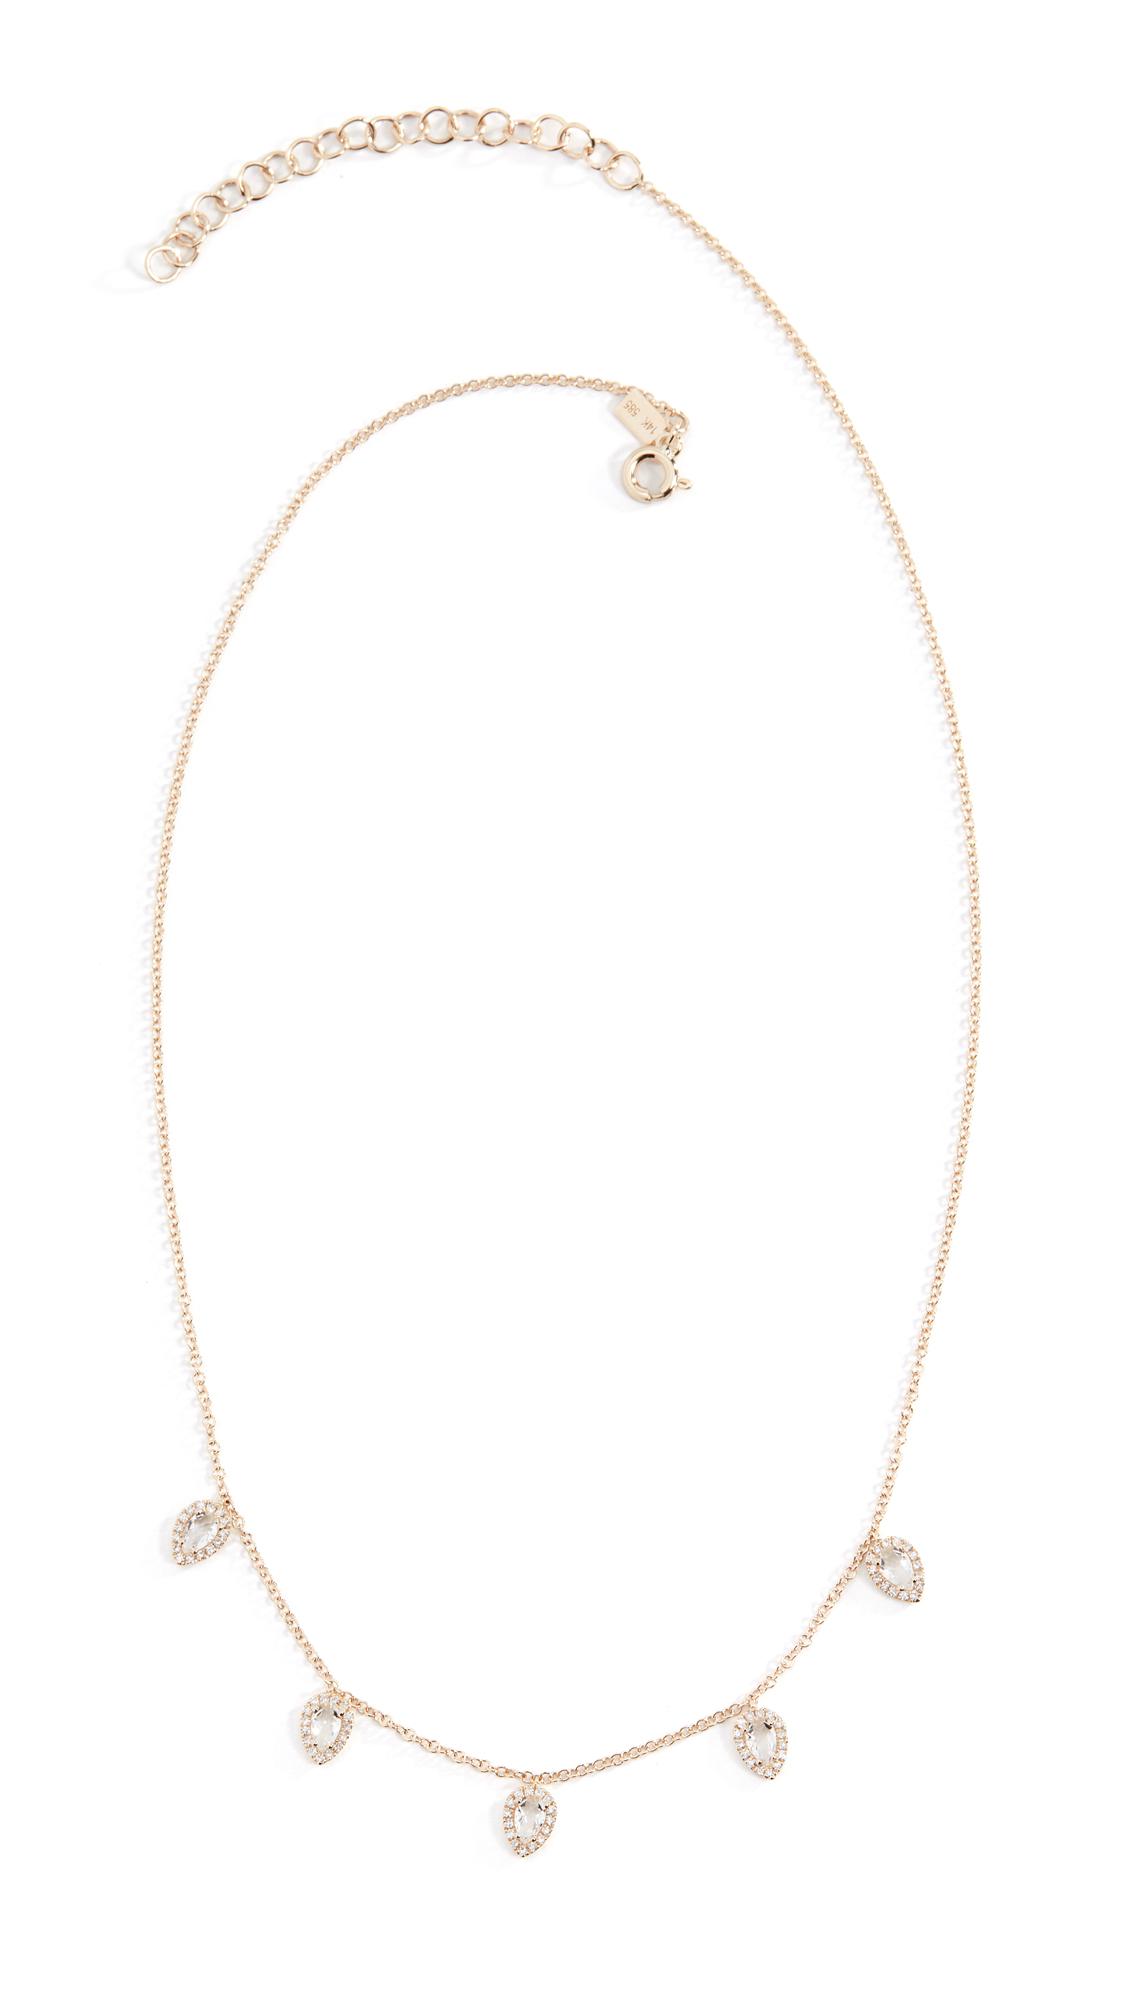 EF Collection 14k Diamond White Topaz Multi Teardrop Necklace - Yellow Gold/Diamond